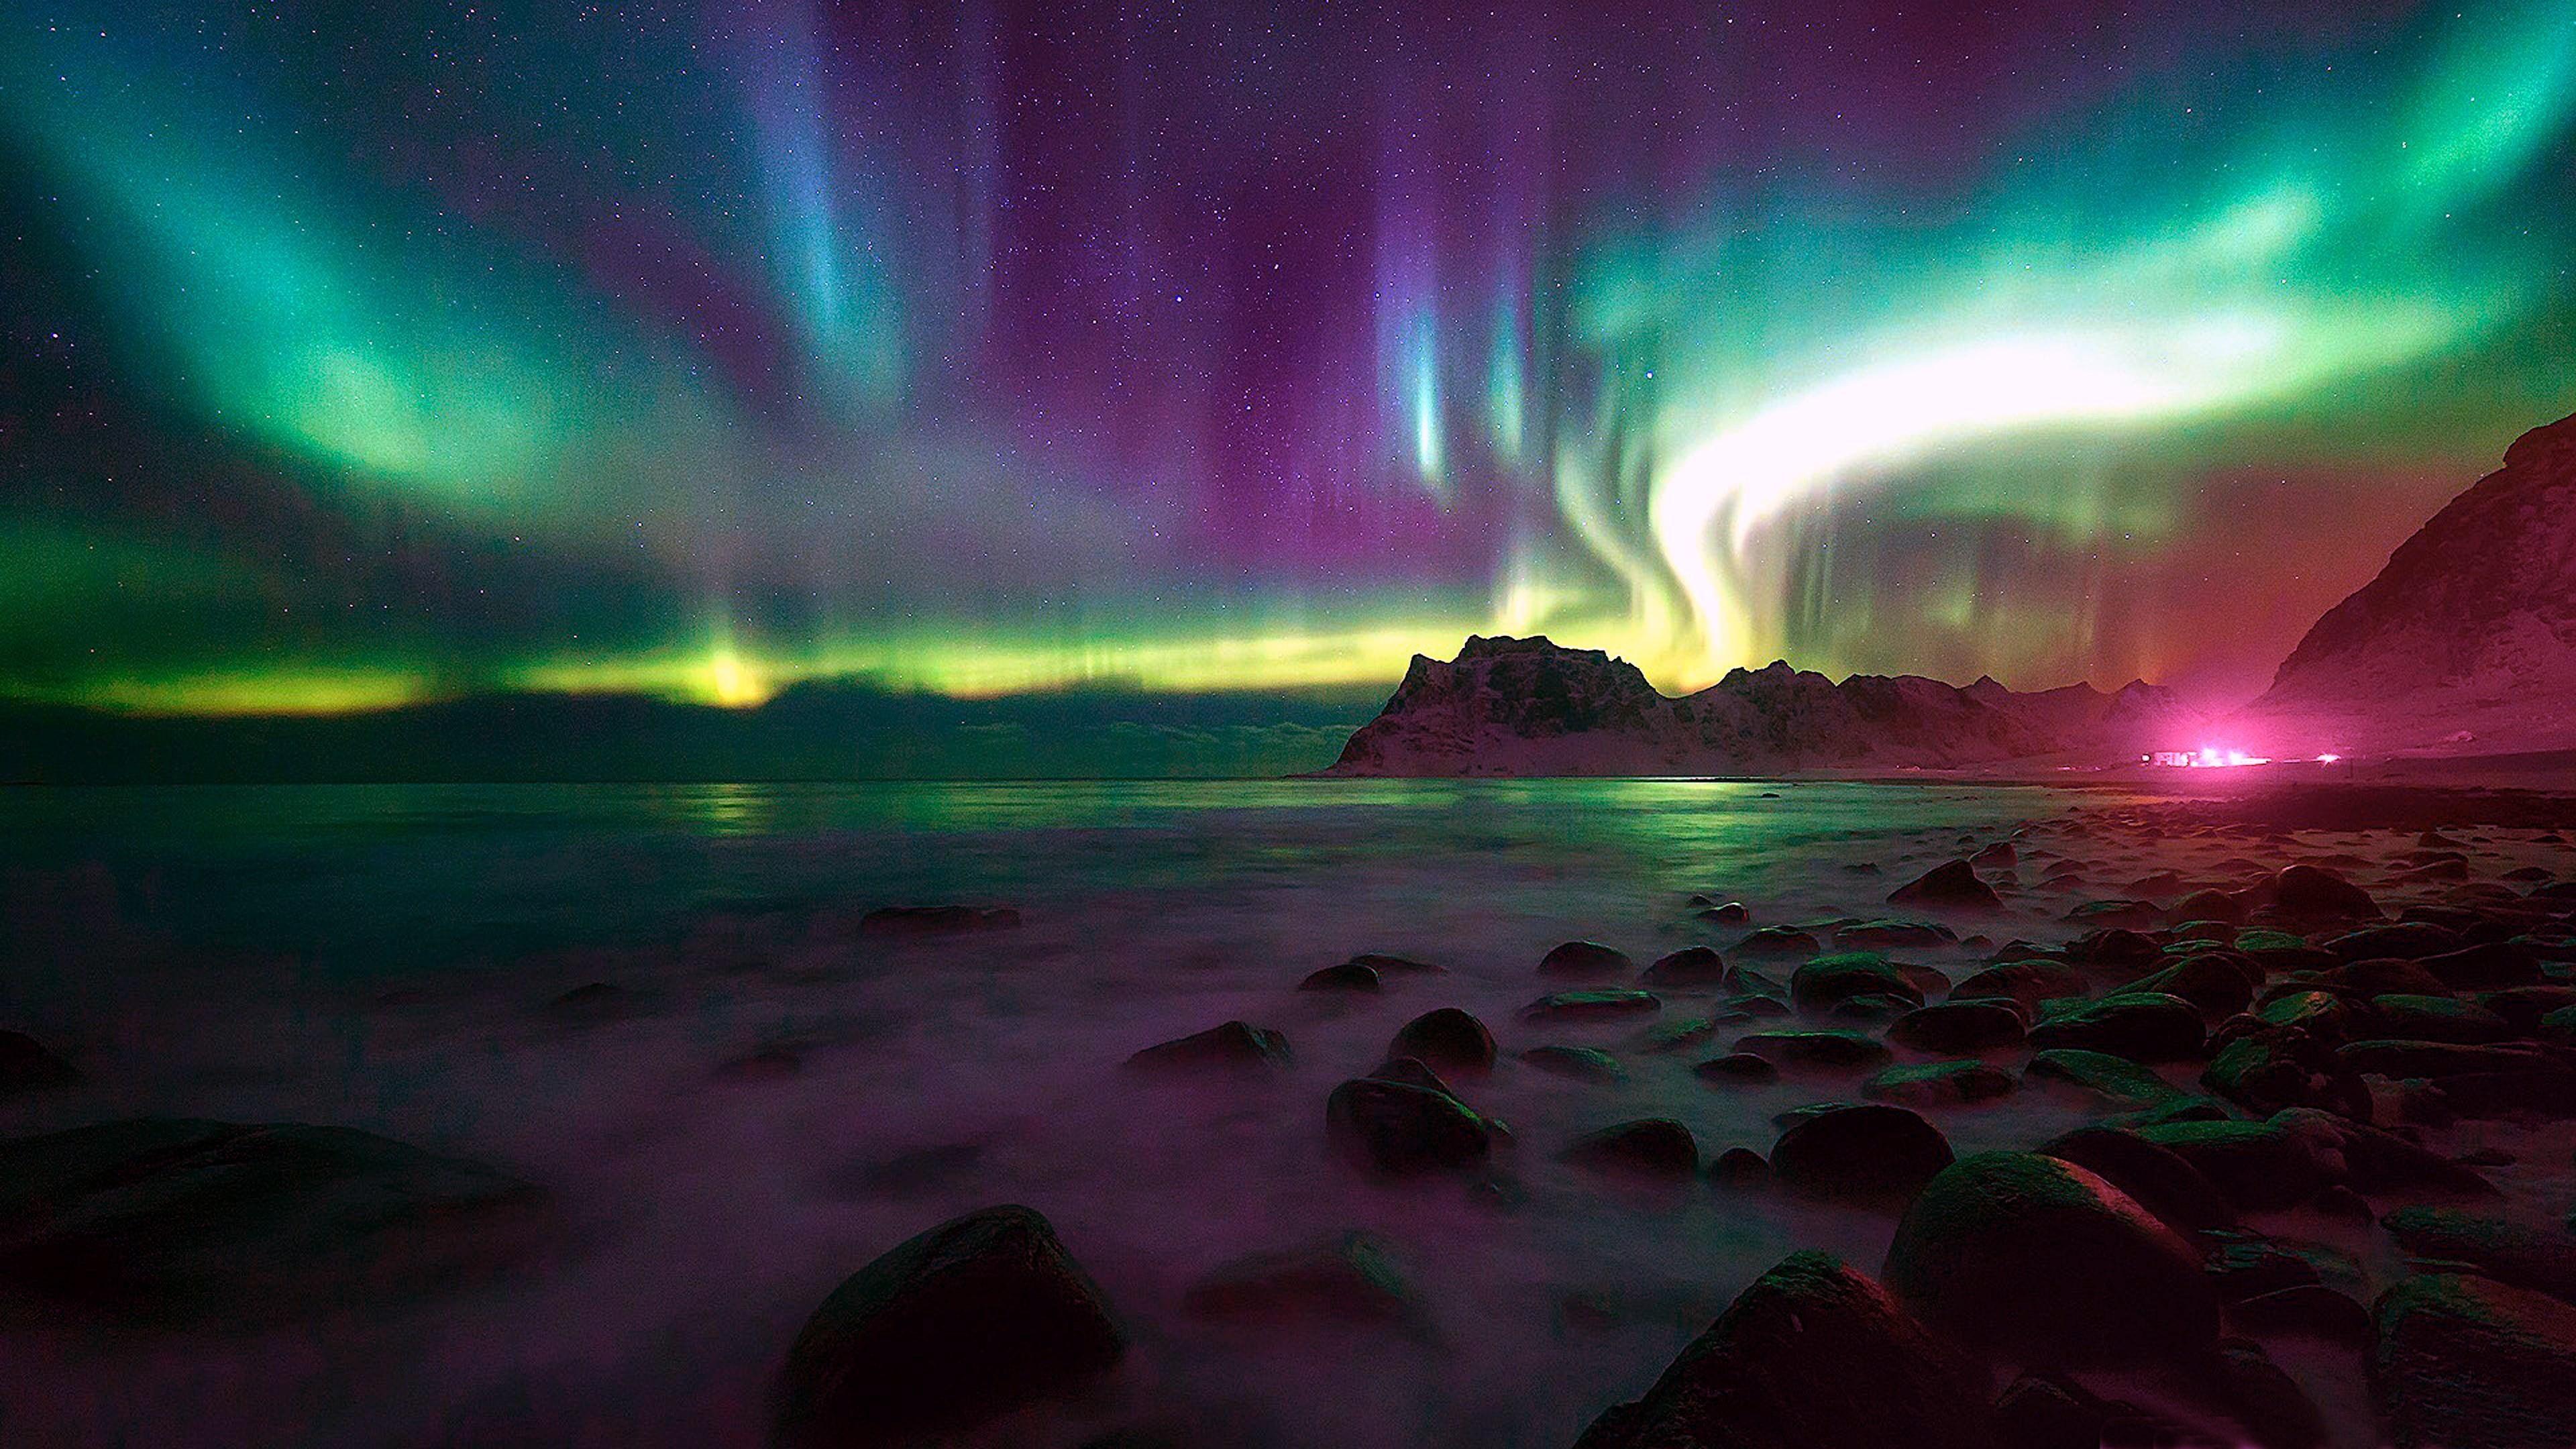 Green Sky Aurora Borealis Night Northern Lights Norway Lofoten Starry Night 4k Wallpaper Hdwallpape Sunrise Wallpaper Aurora Borealis Wallpaper Green Sky